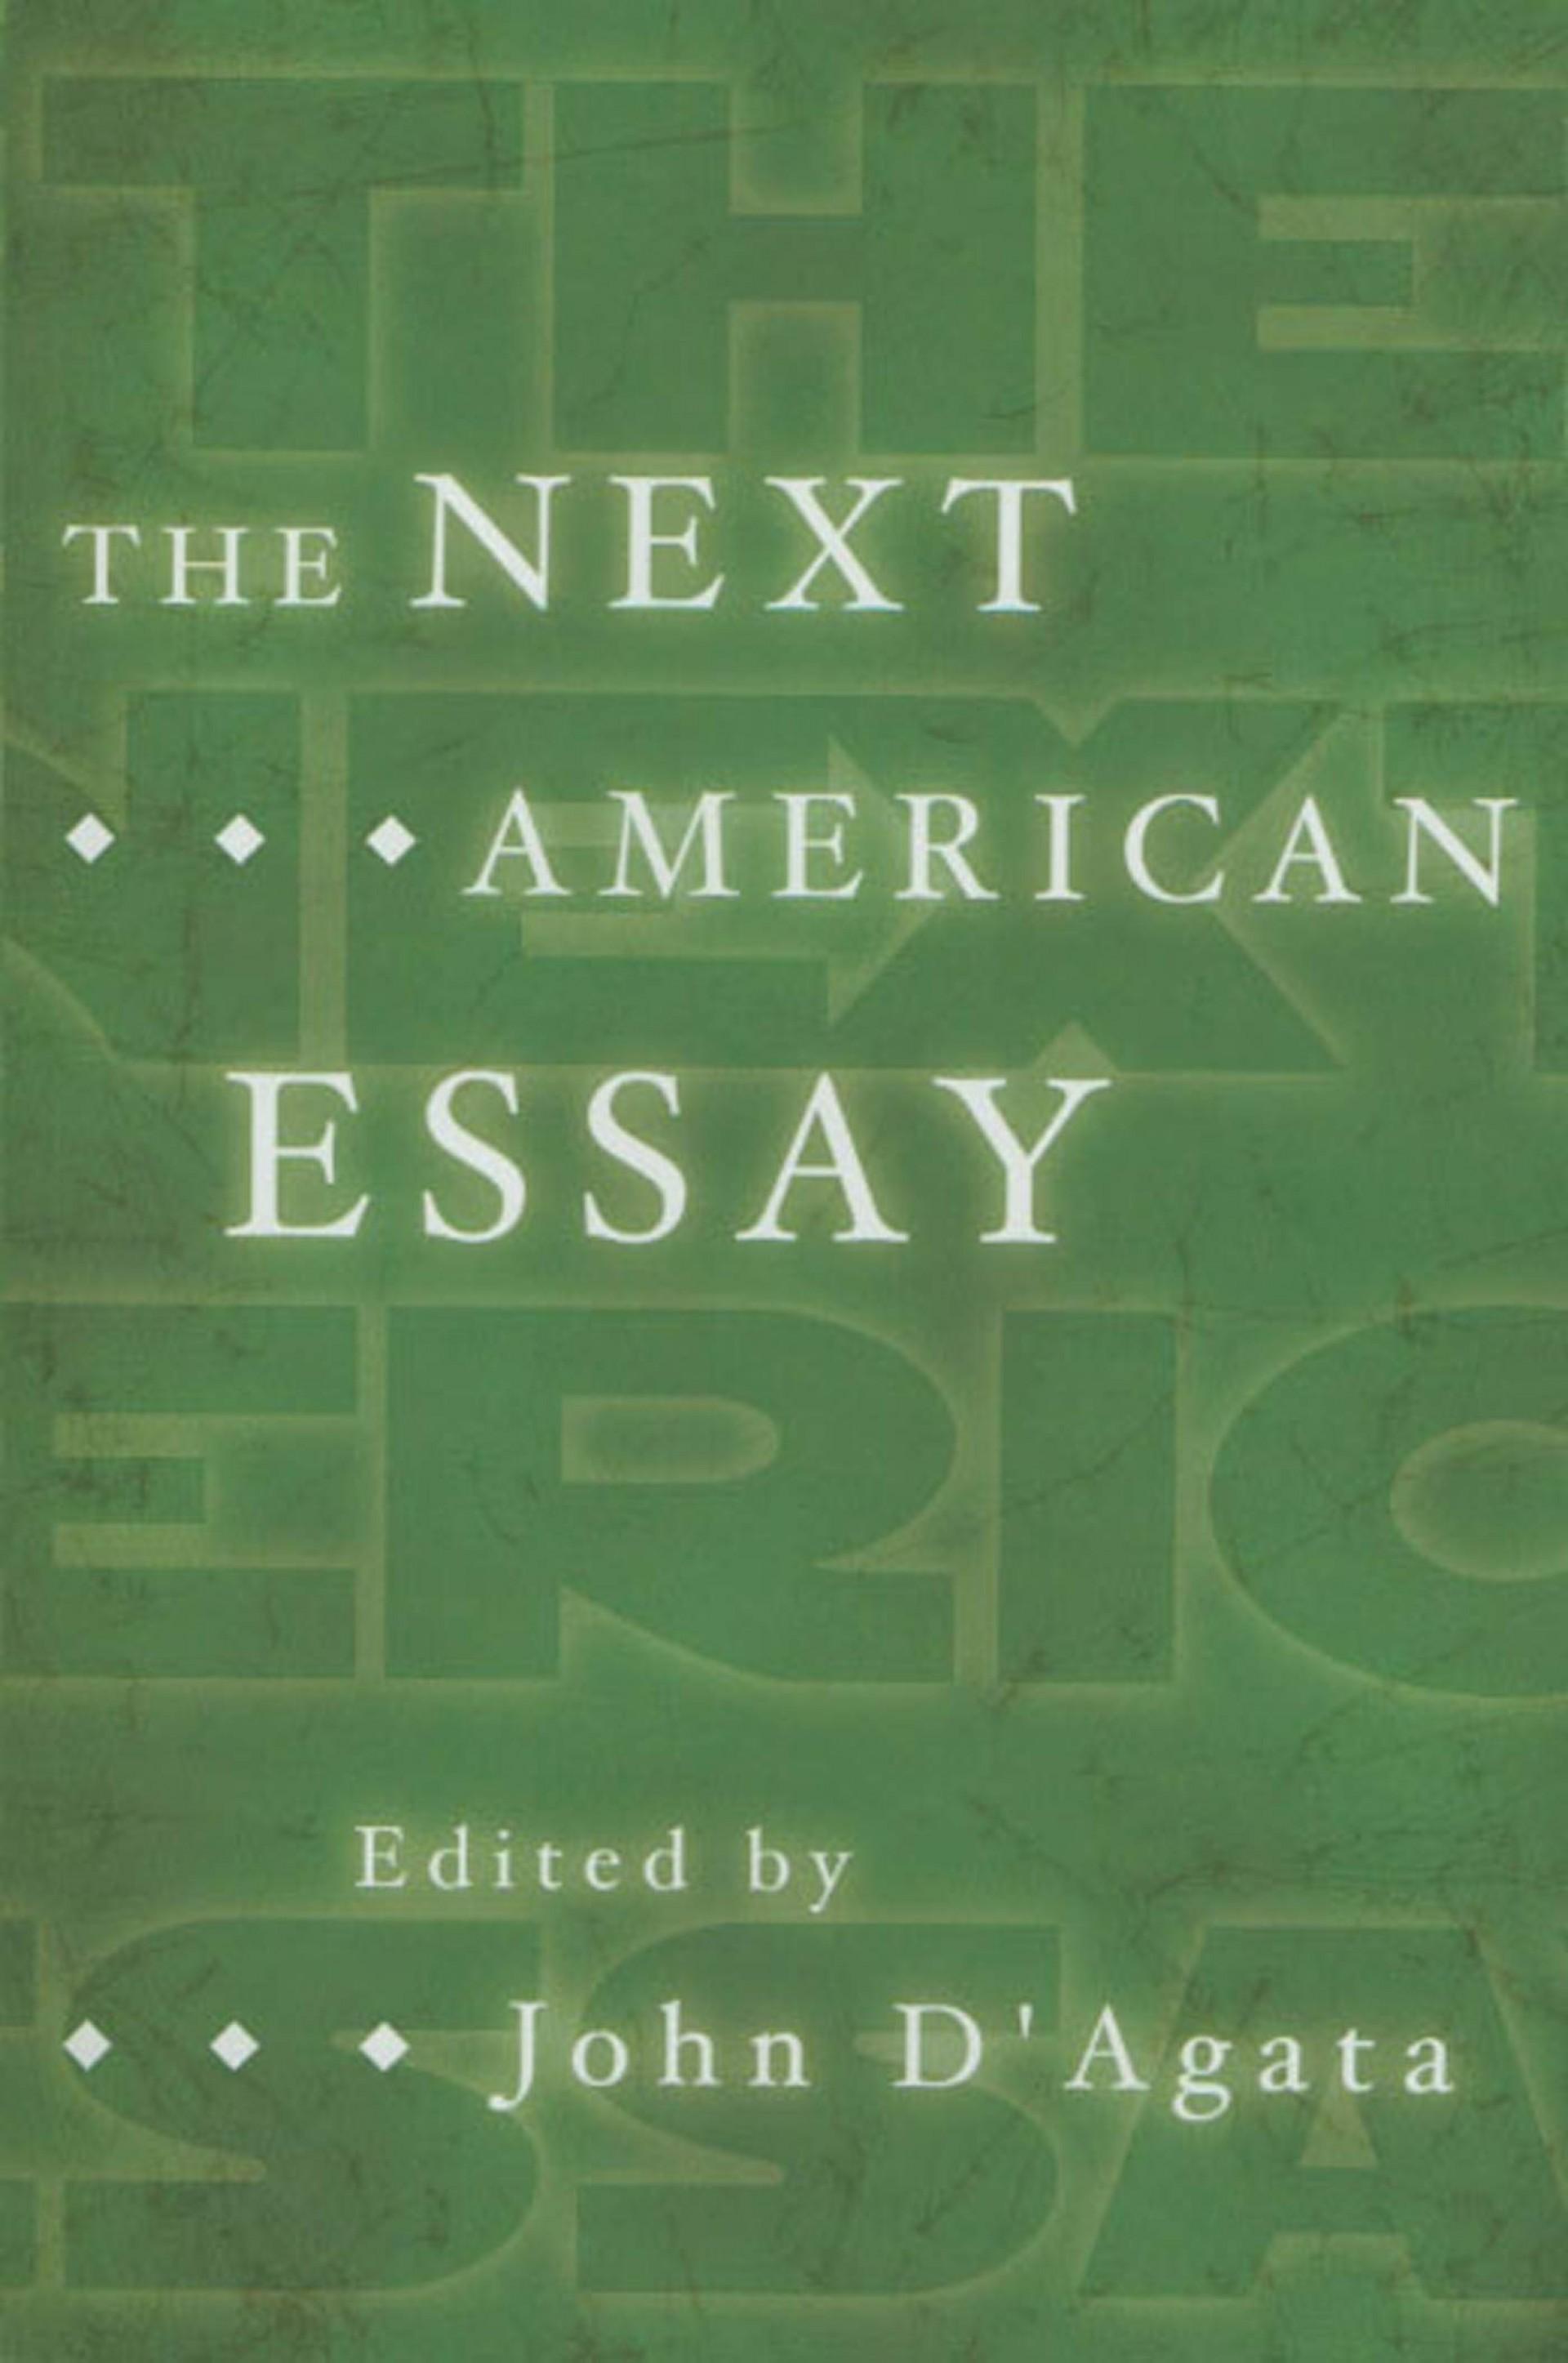 006 John Agata Essay 61uwmdqvqdl Stirring D D'agata Next American The Pdf 1920